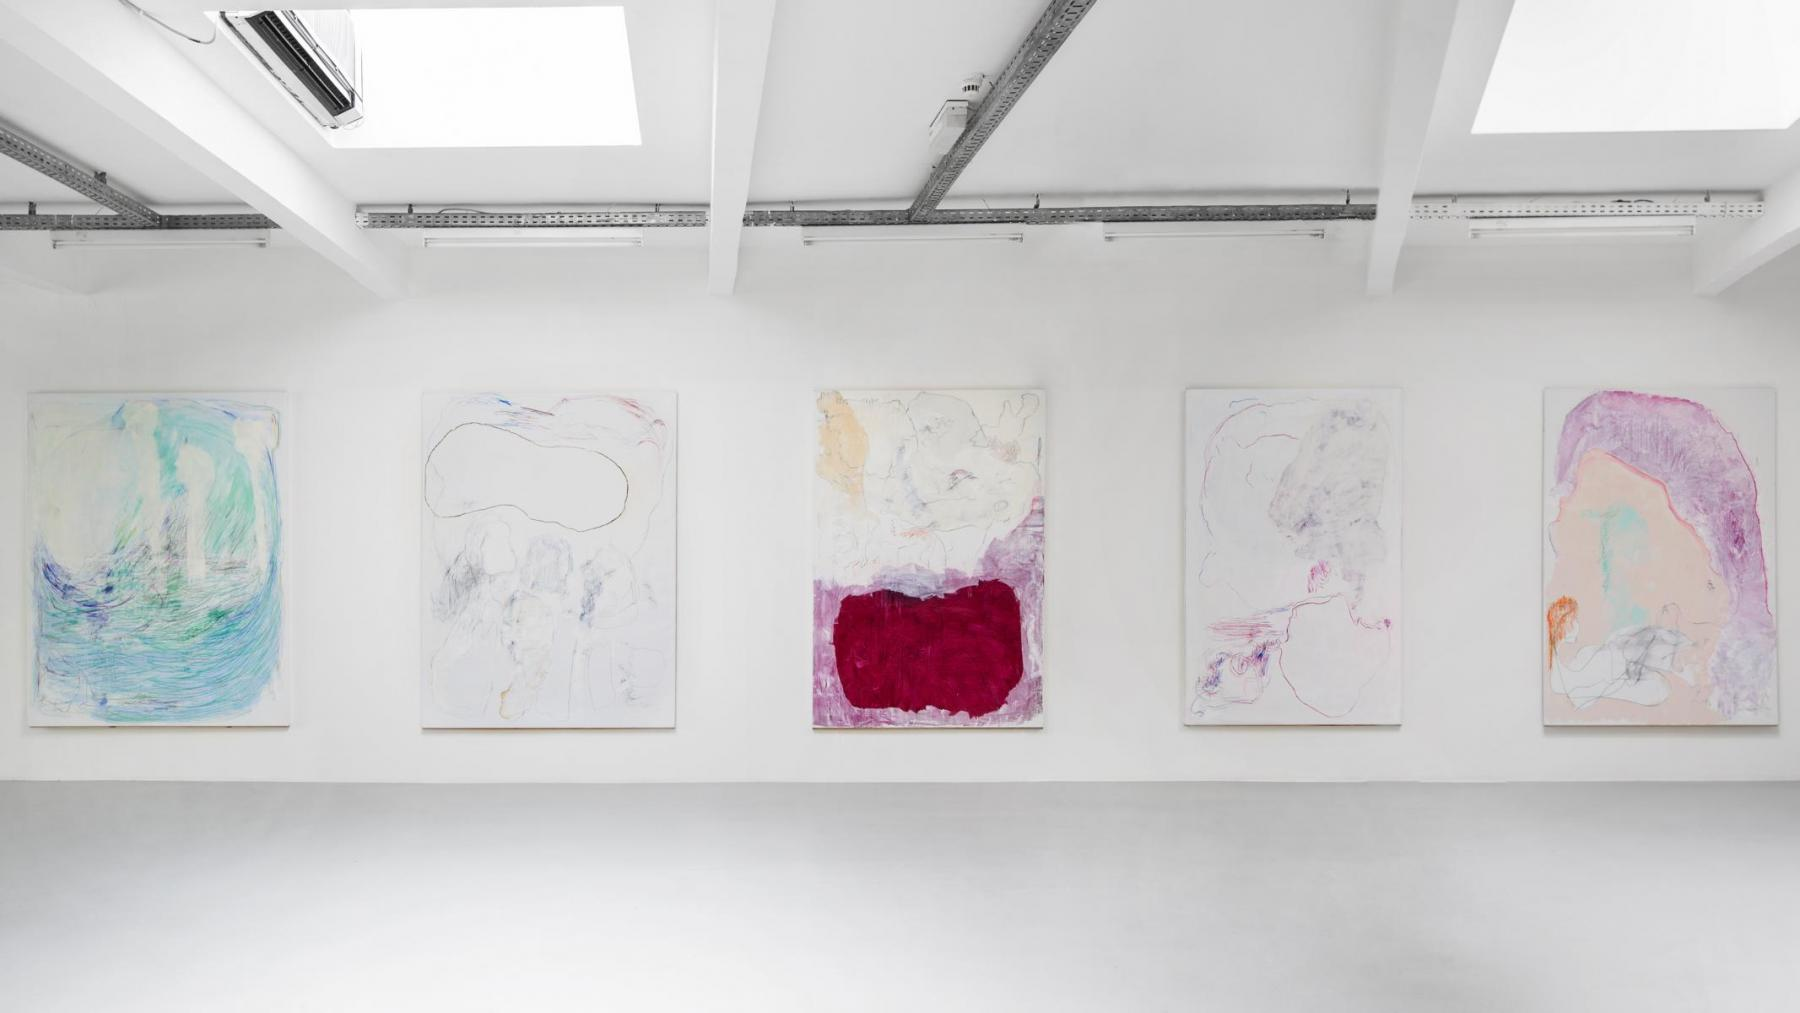 K1600_Mosny_Gonn_2017_Ausstellungsansicht_Verena_Nagl_04